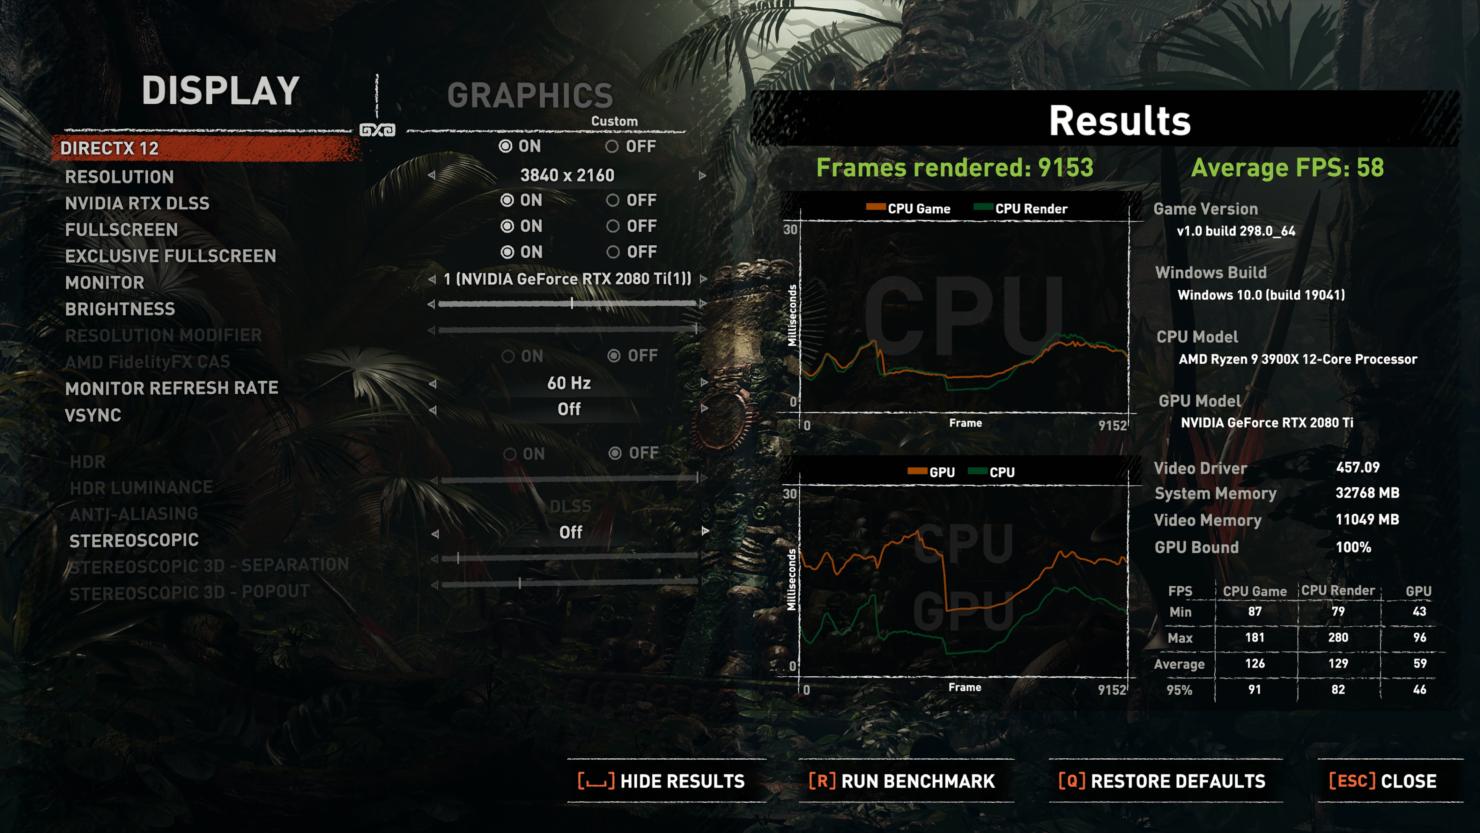 nvidia-geforce-rtx-2080-ti-raytracing-benchmark_4k_dlss